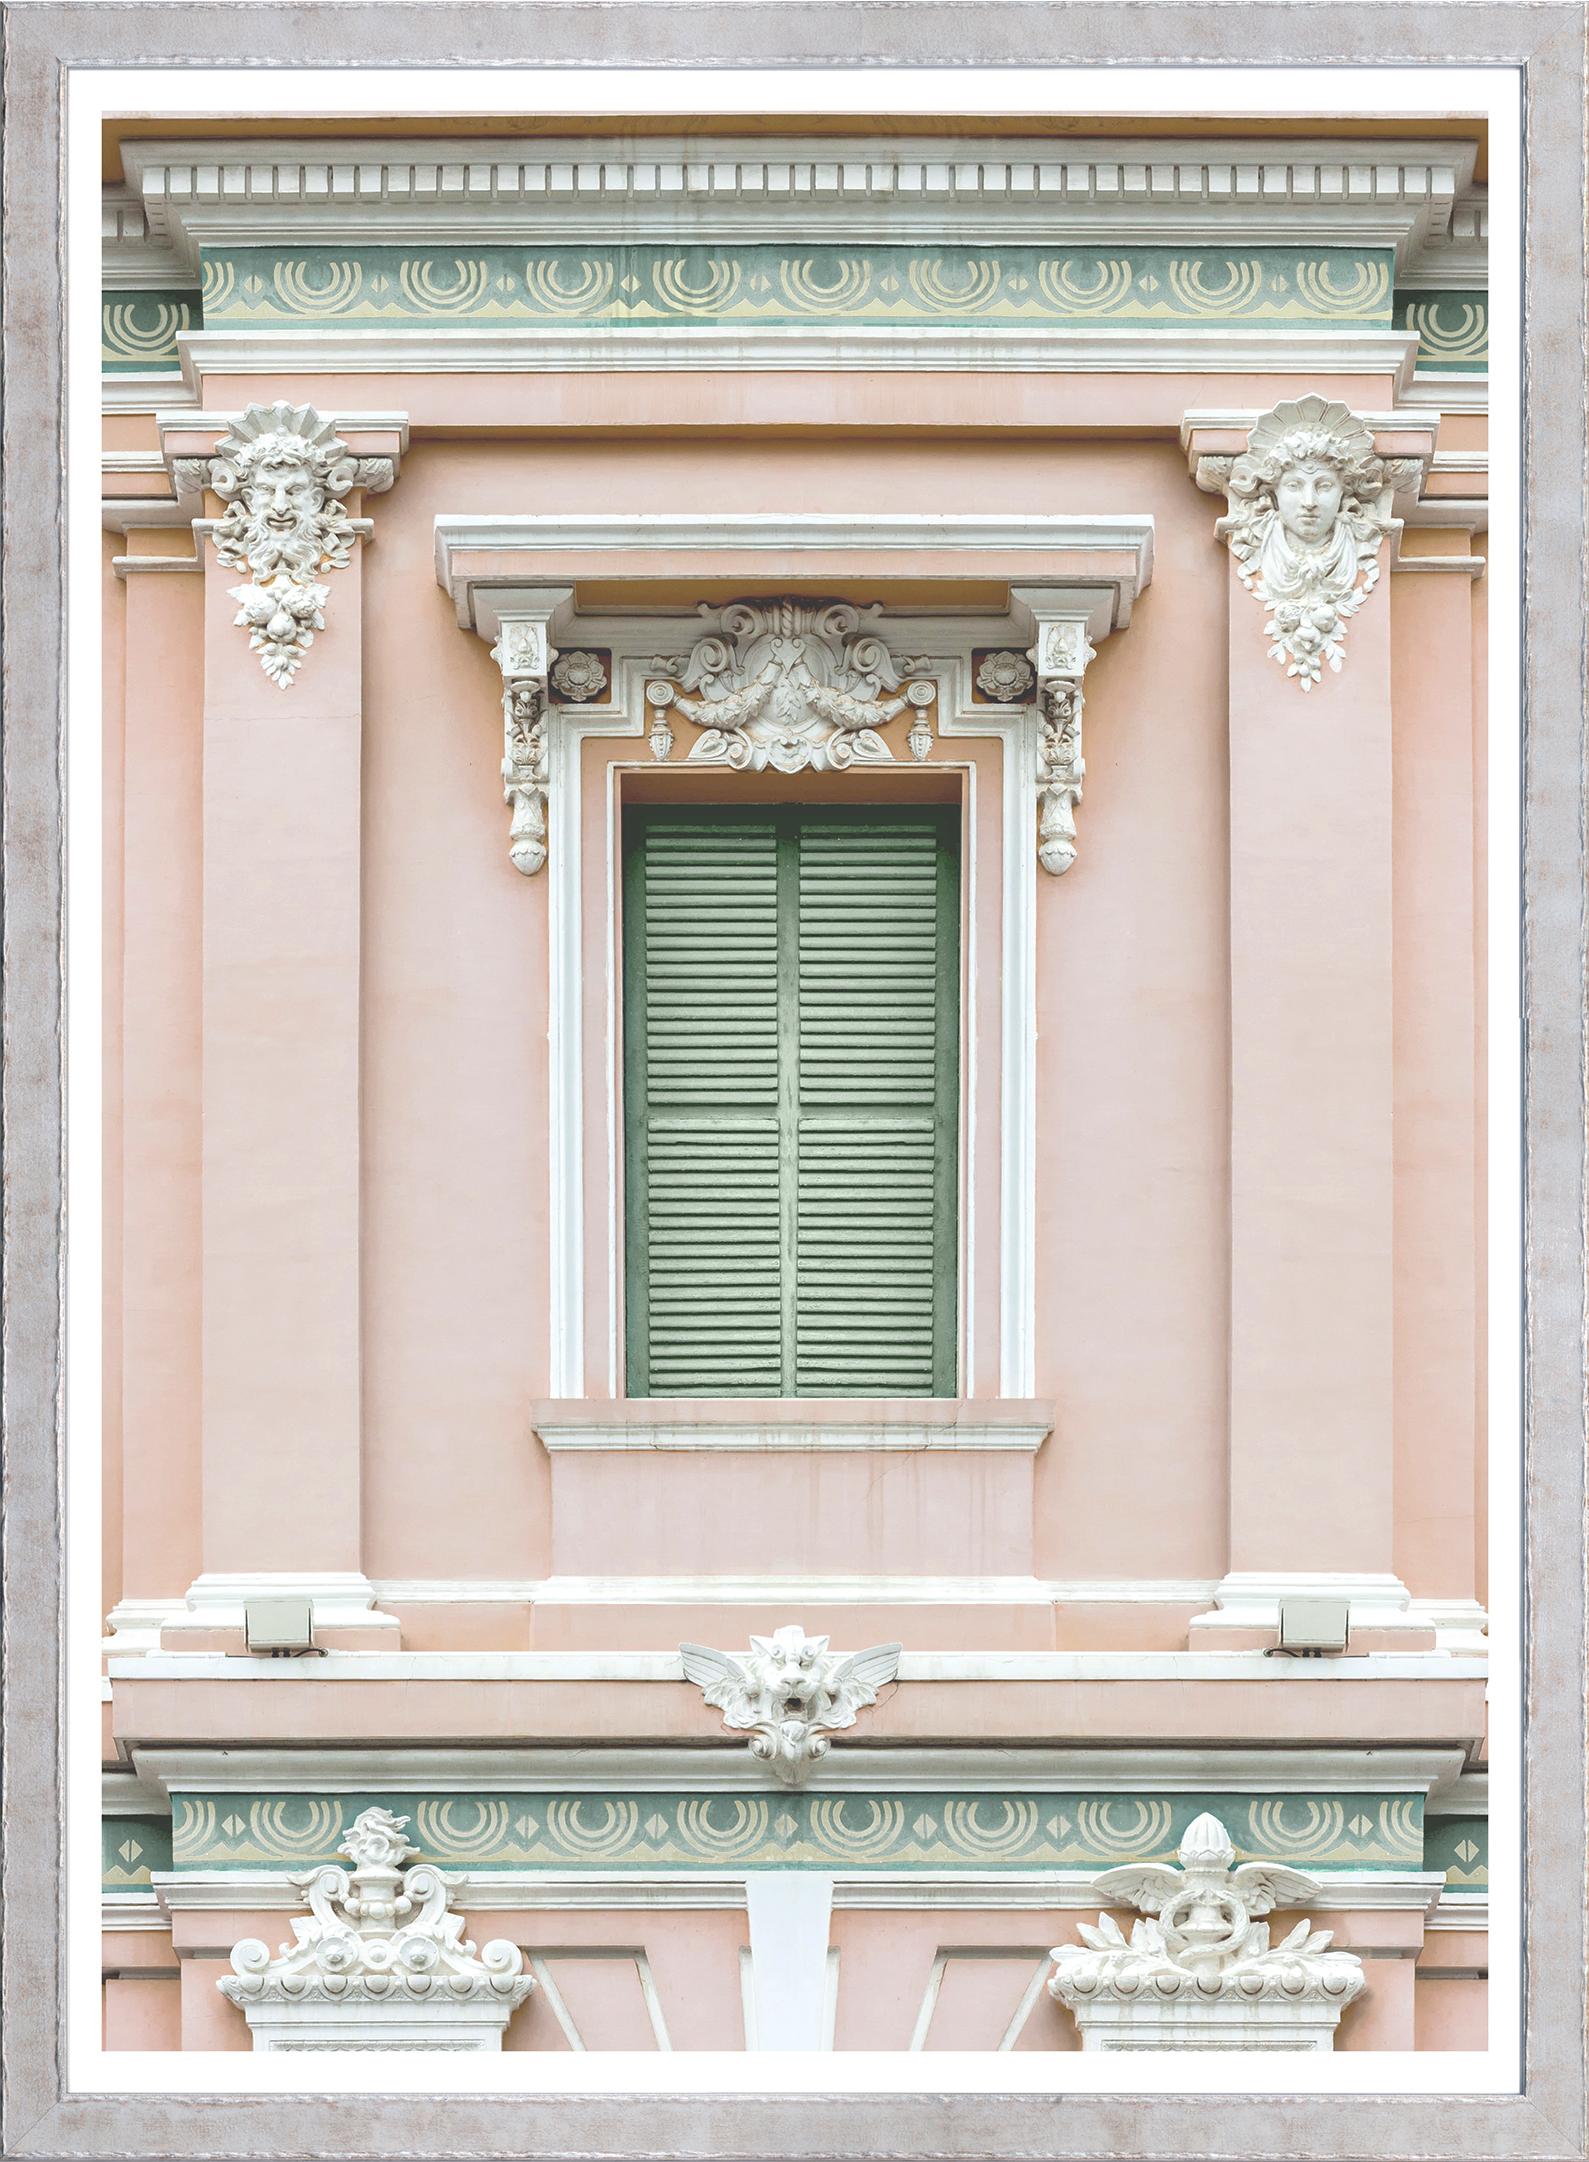 Celadon Art Pastel Revival